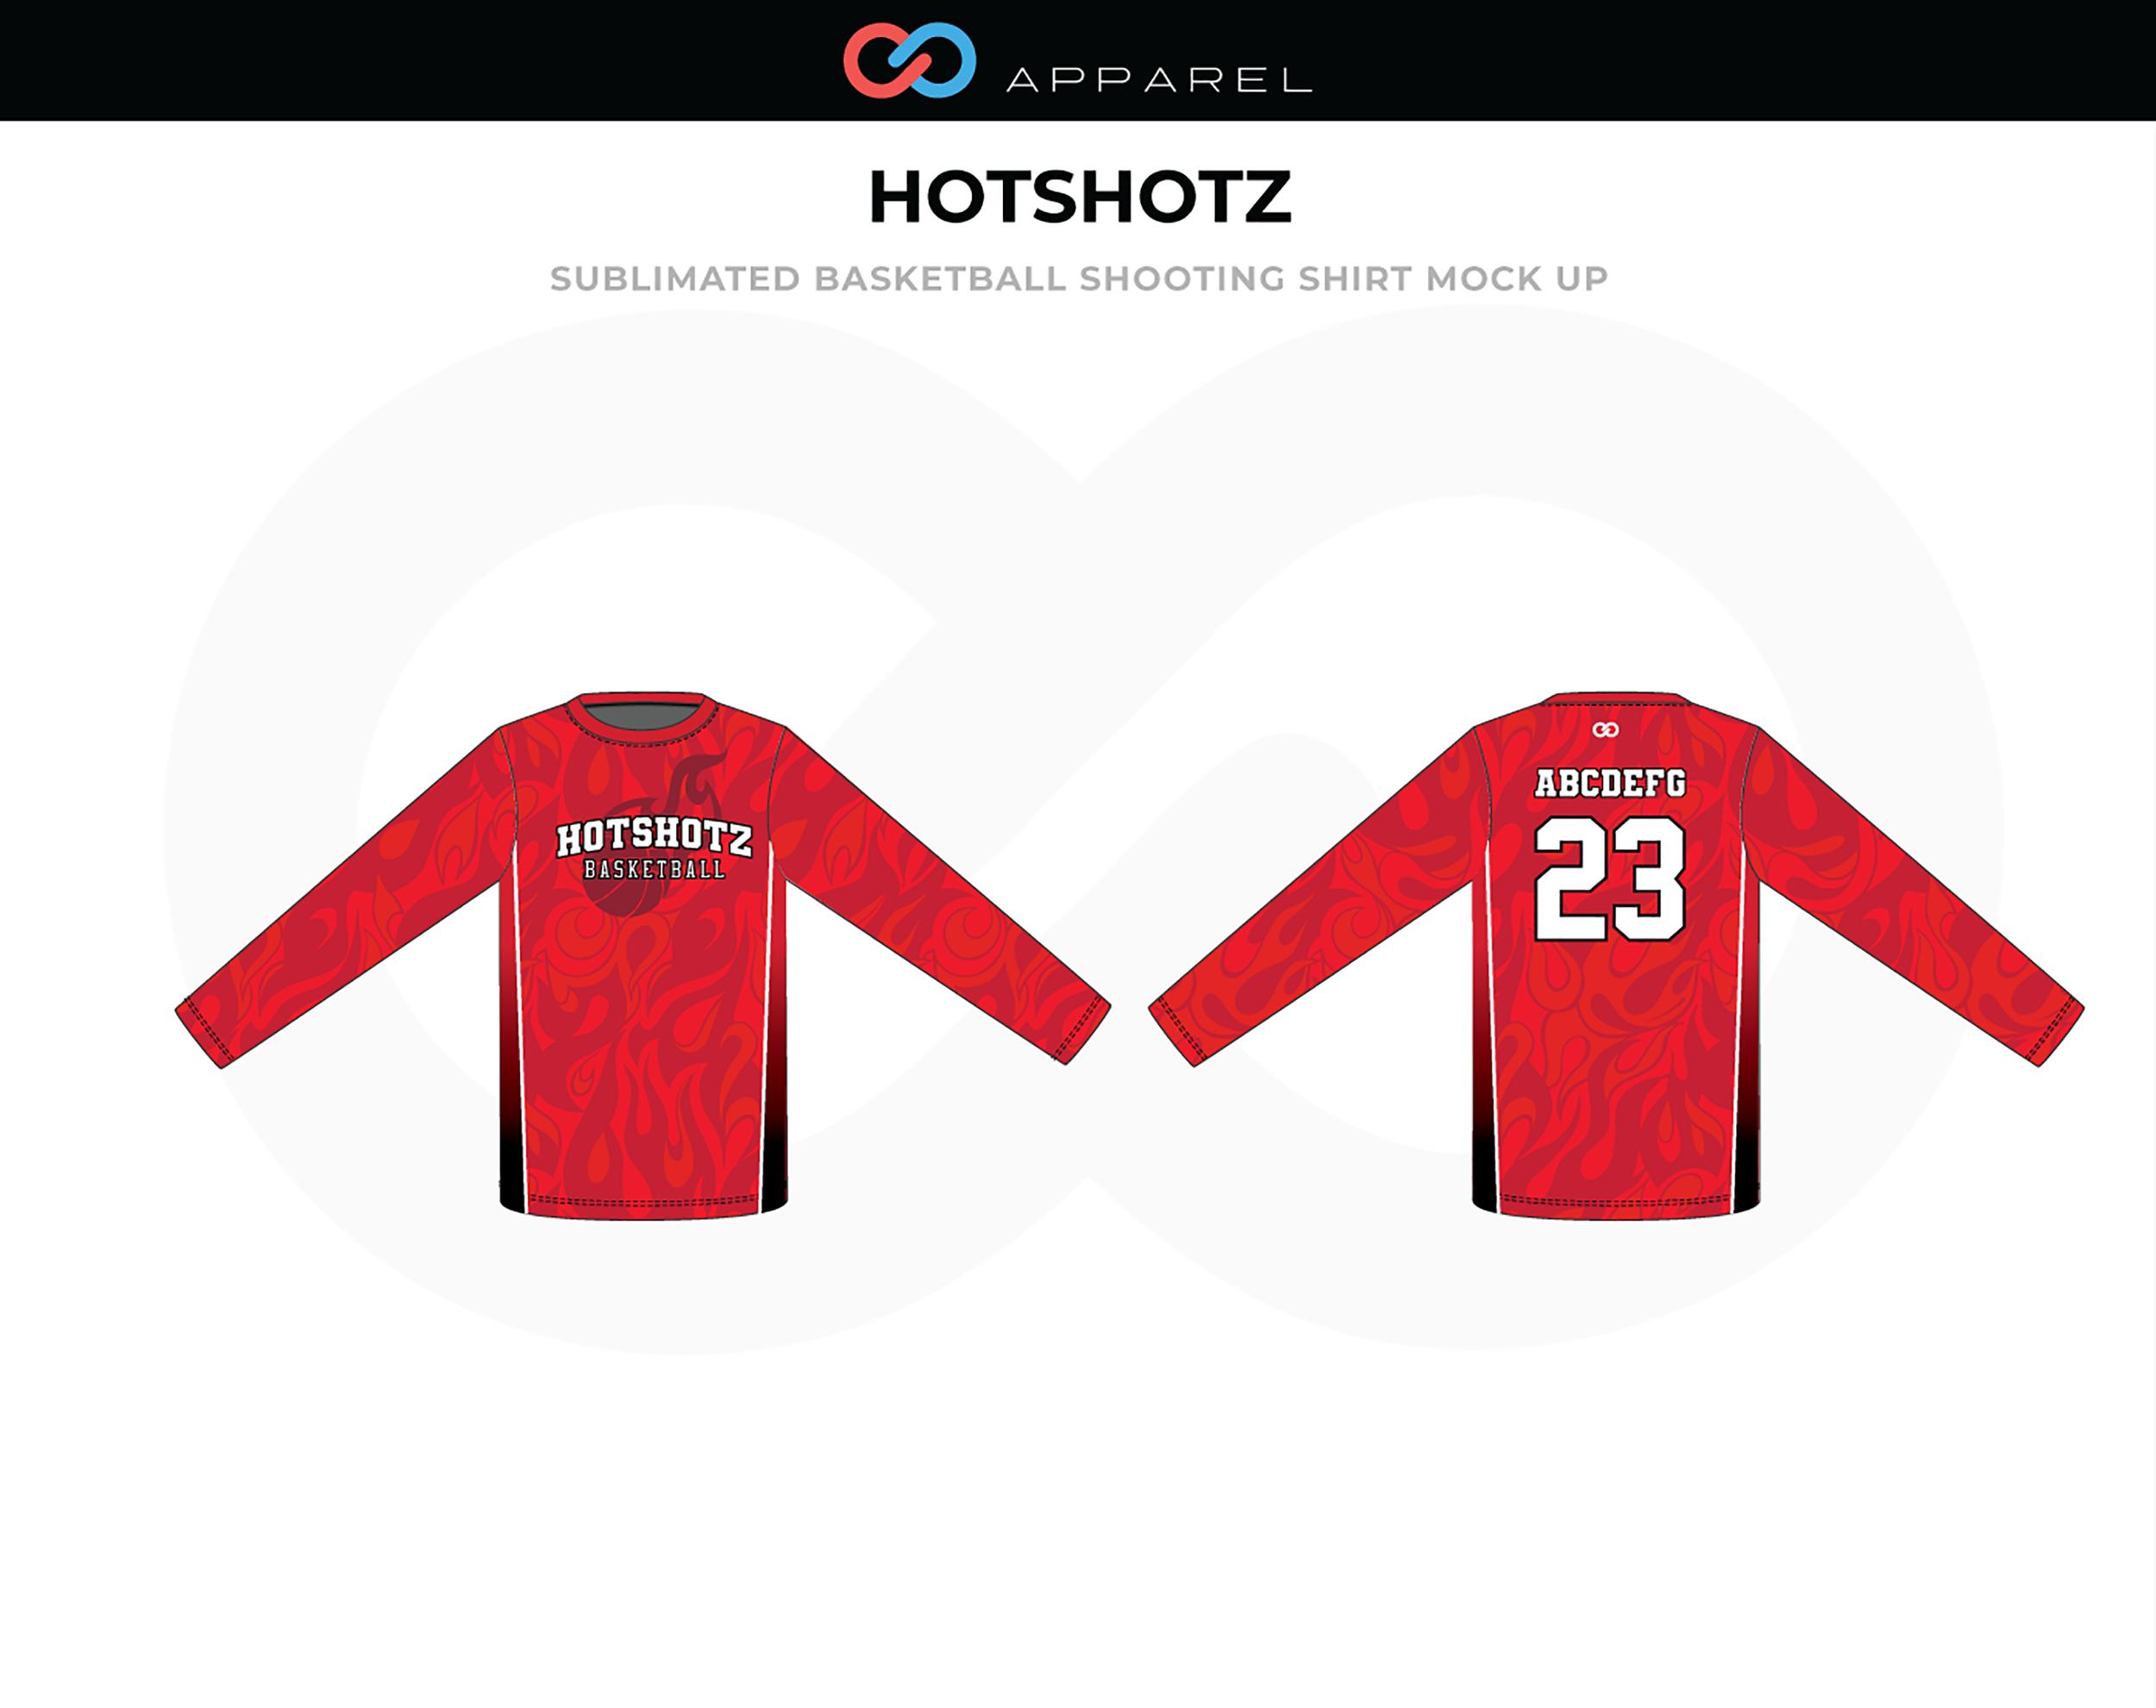 Hotshotz-Basketball-Sublimated-Basketball-Shooting-Shirt-Mock-Up.png